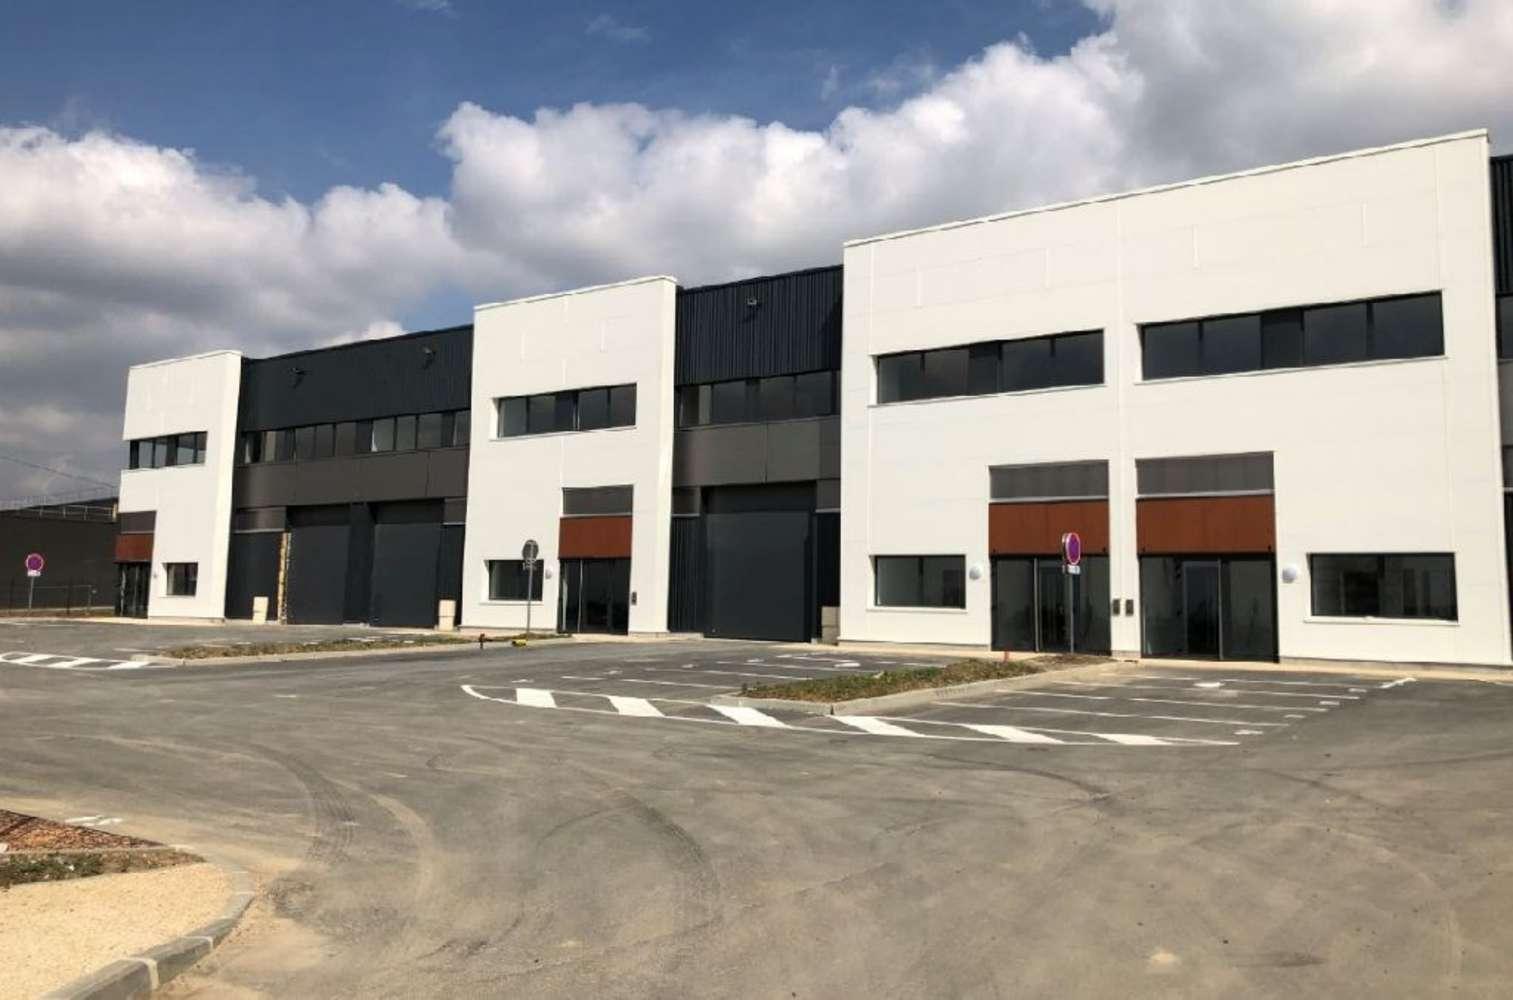 Activités/entrepôt Groslay, 95410 - MONTS DU VAL D'OISE - 10084589